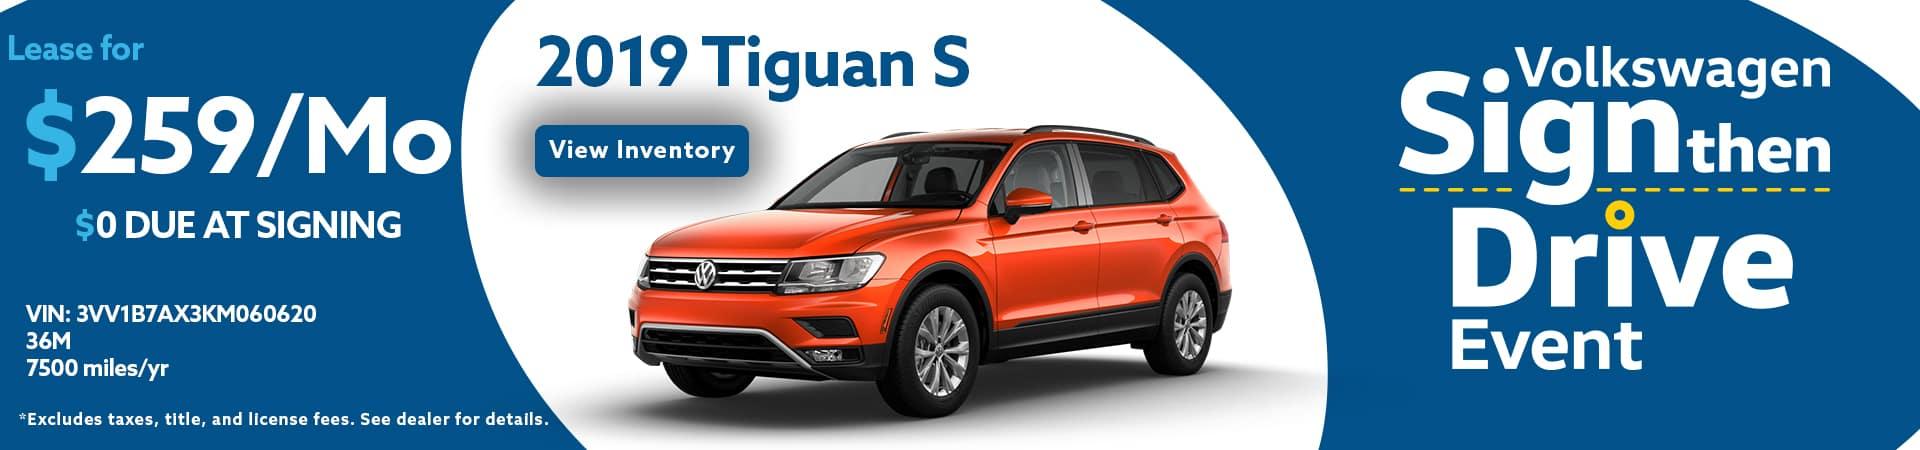 New Used Volkswagen Dealer Eich Vw St Cloud Sartell